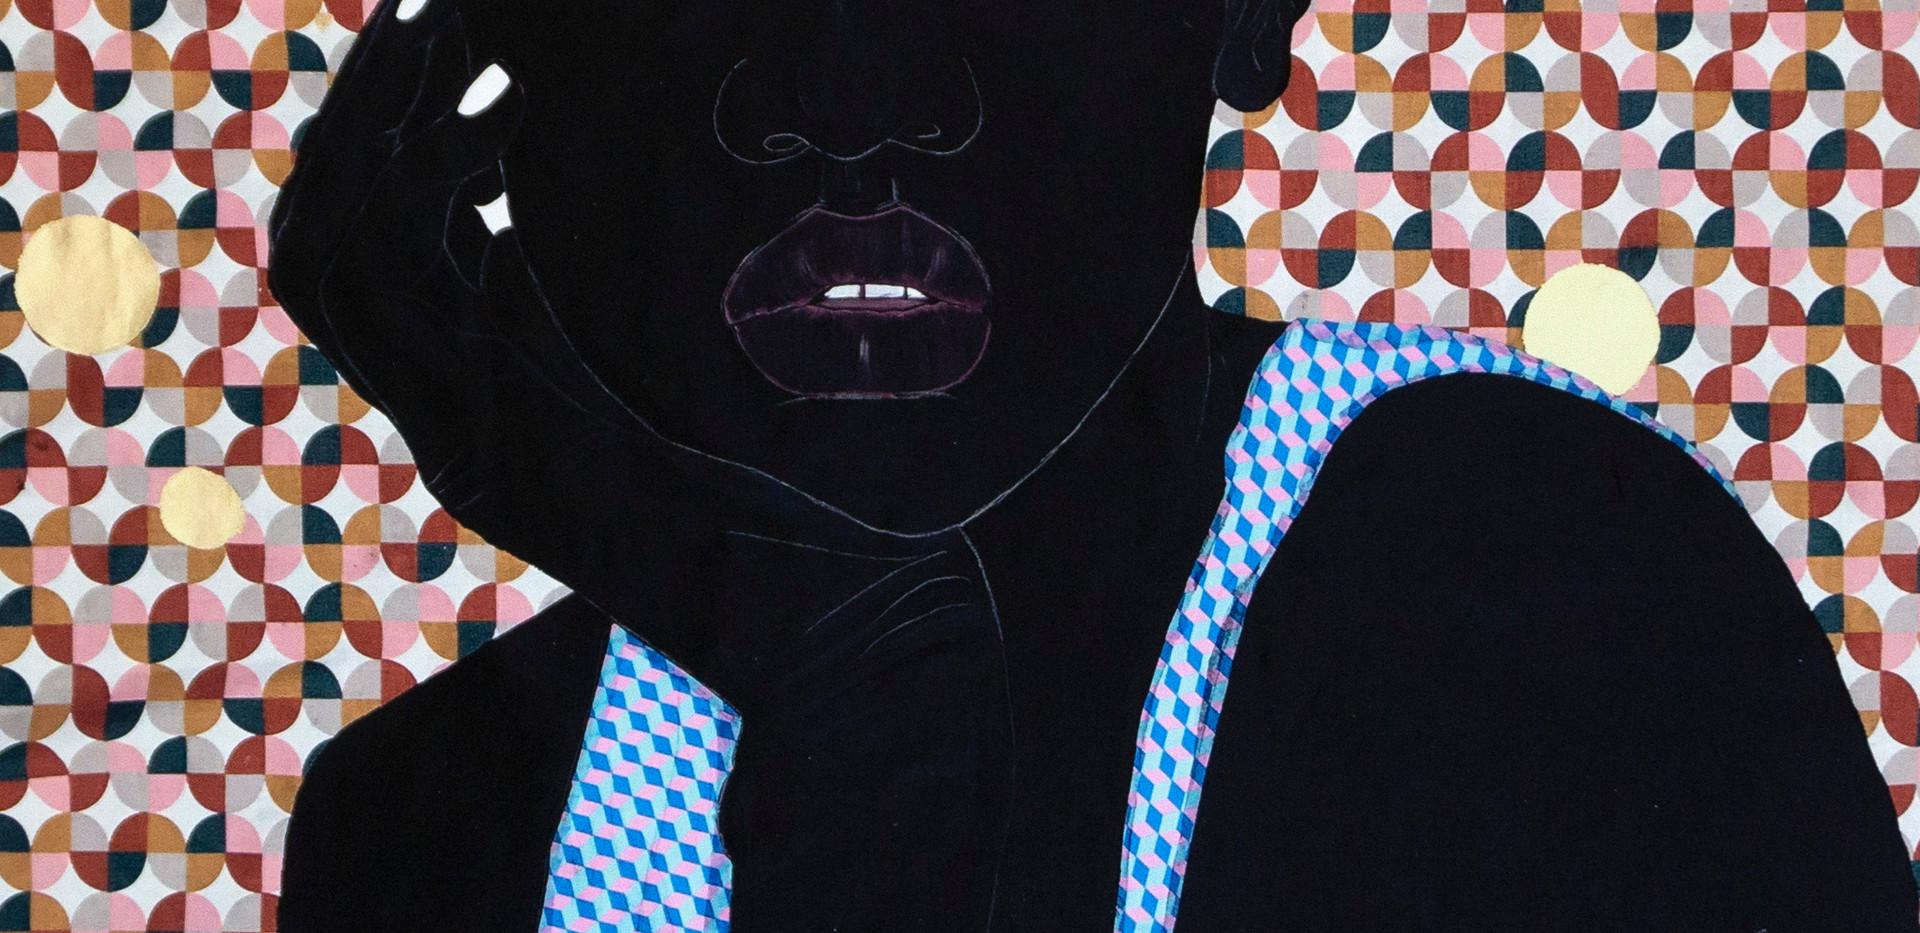 Idris Habib, Nailah, 2020, 24 x 18 in, Print on paper